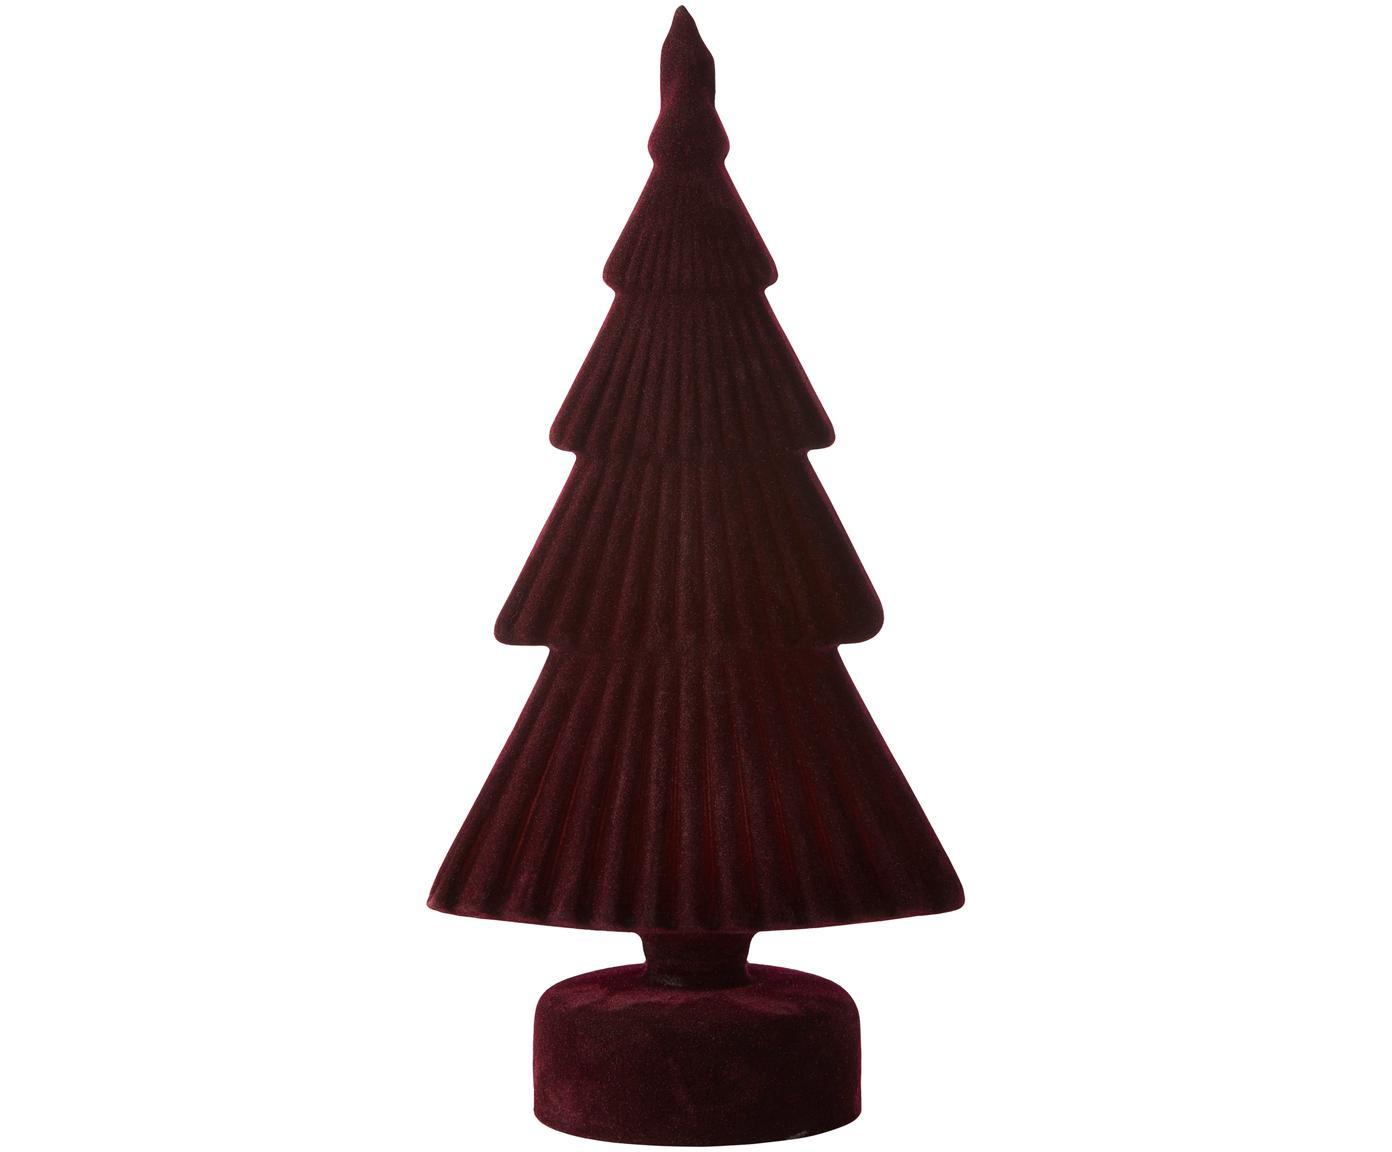 Decoratief object Velvie Christmas Tree, Bekleding: polyester, Donkerrood, 13 x 27 cm